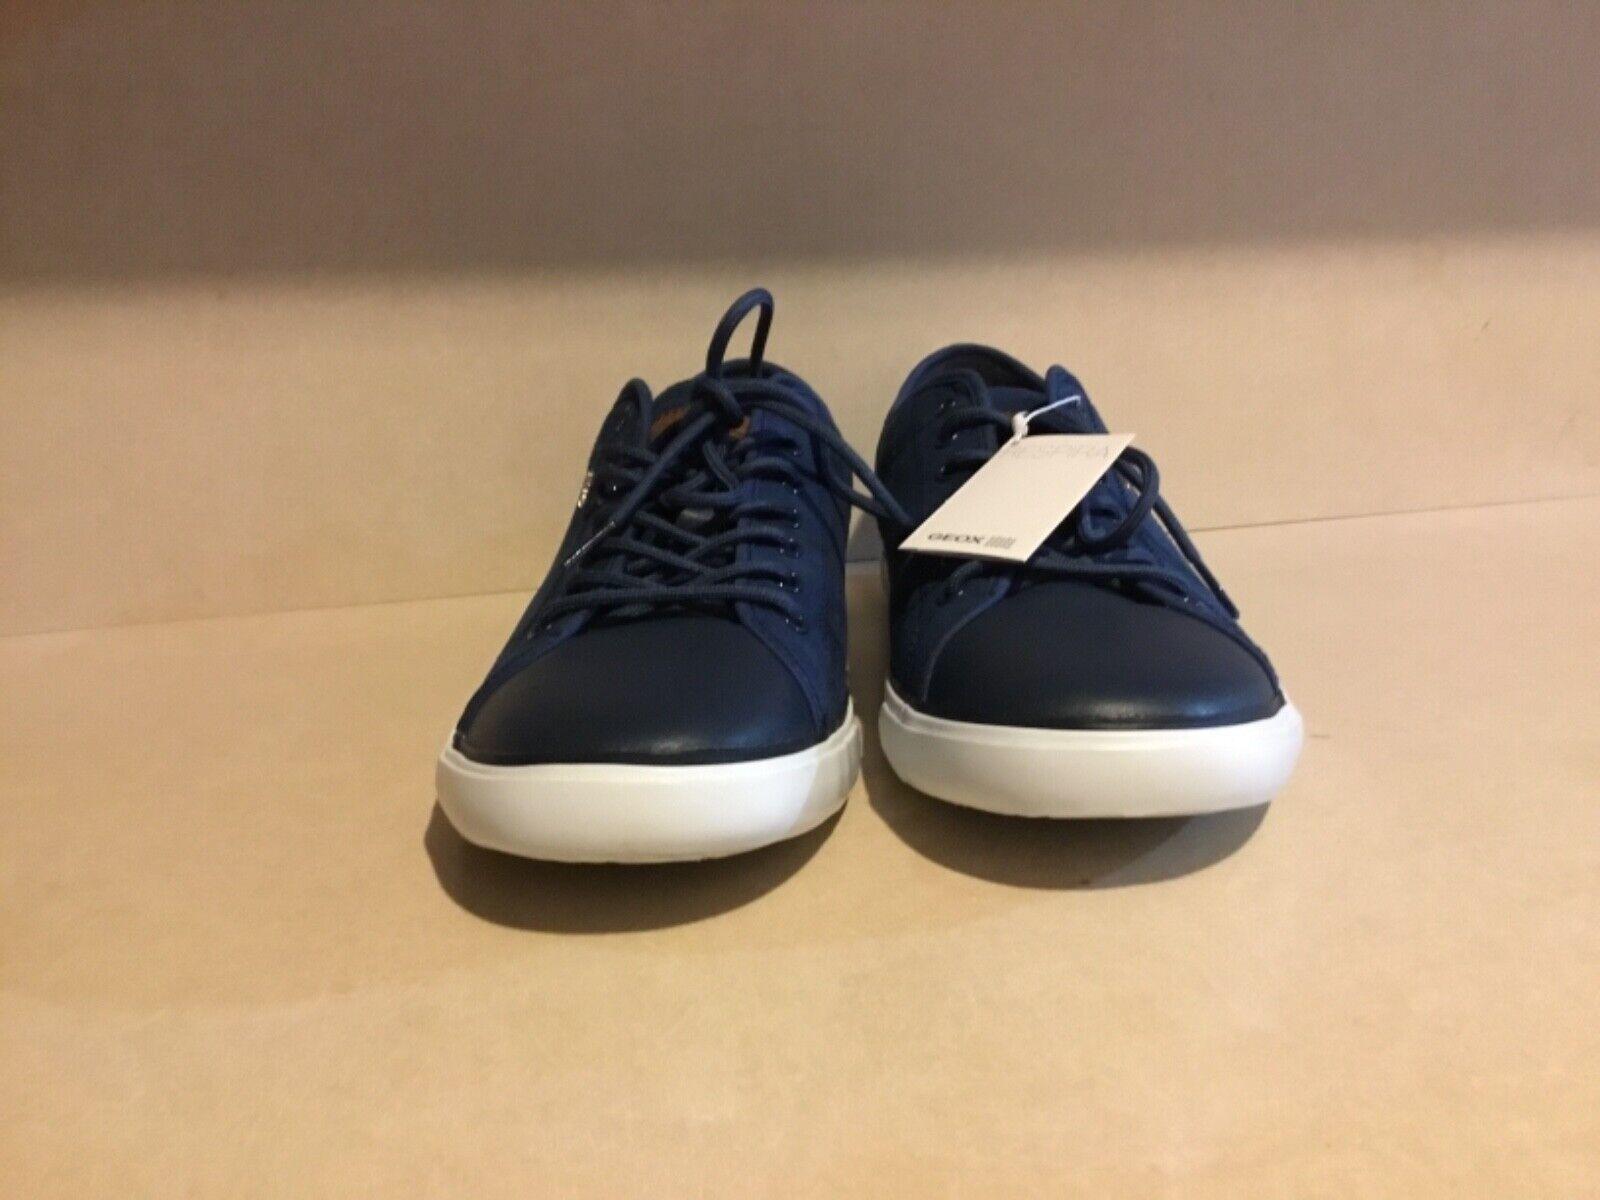 Geox respira men, Italian made casual bluee leather sneakers, super nice. US12.5